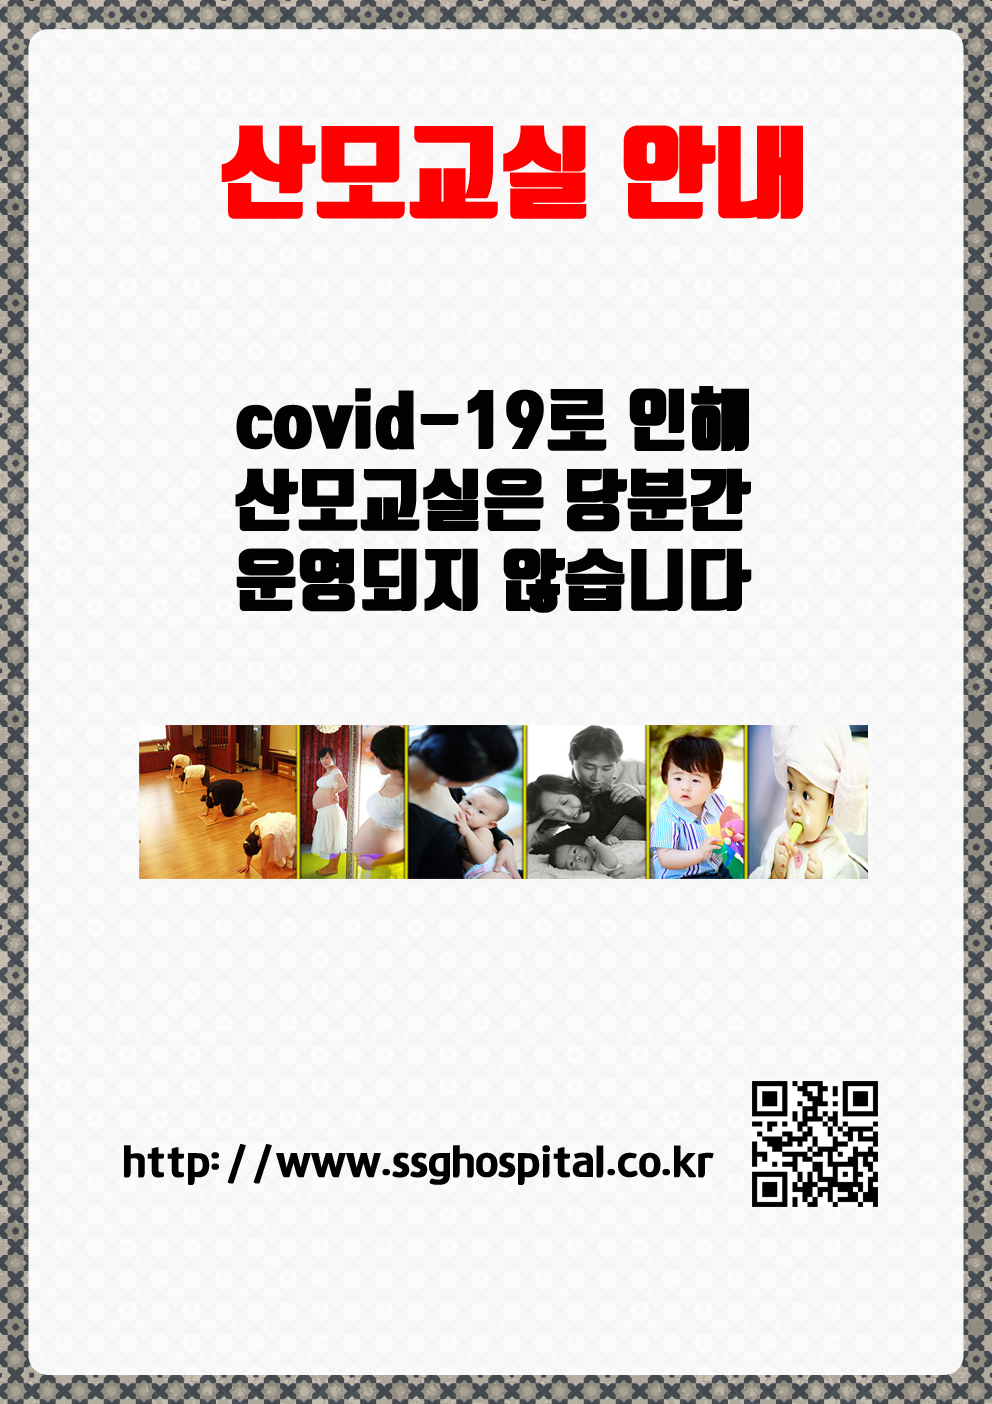 6c544b3add8d4dd5dde7e015169af3d1_1594012